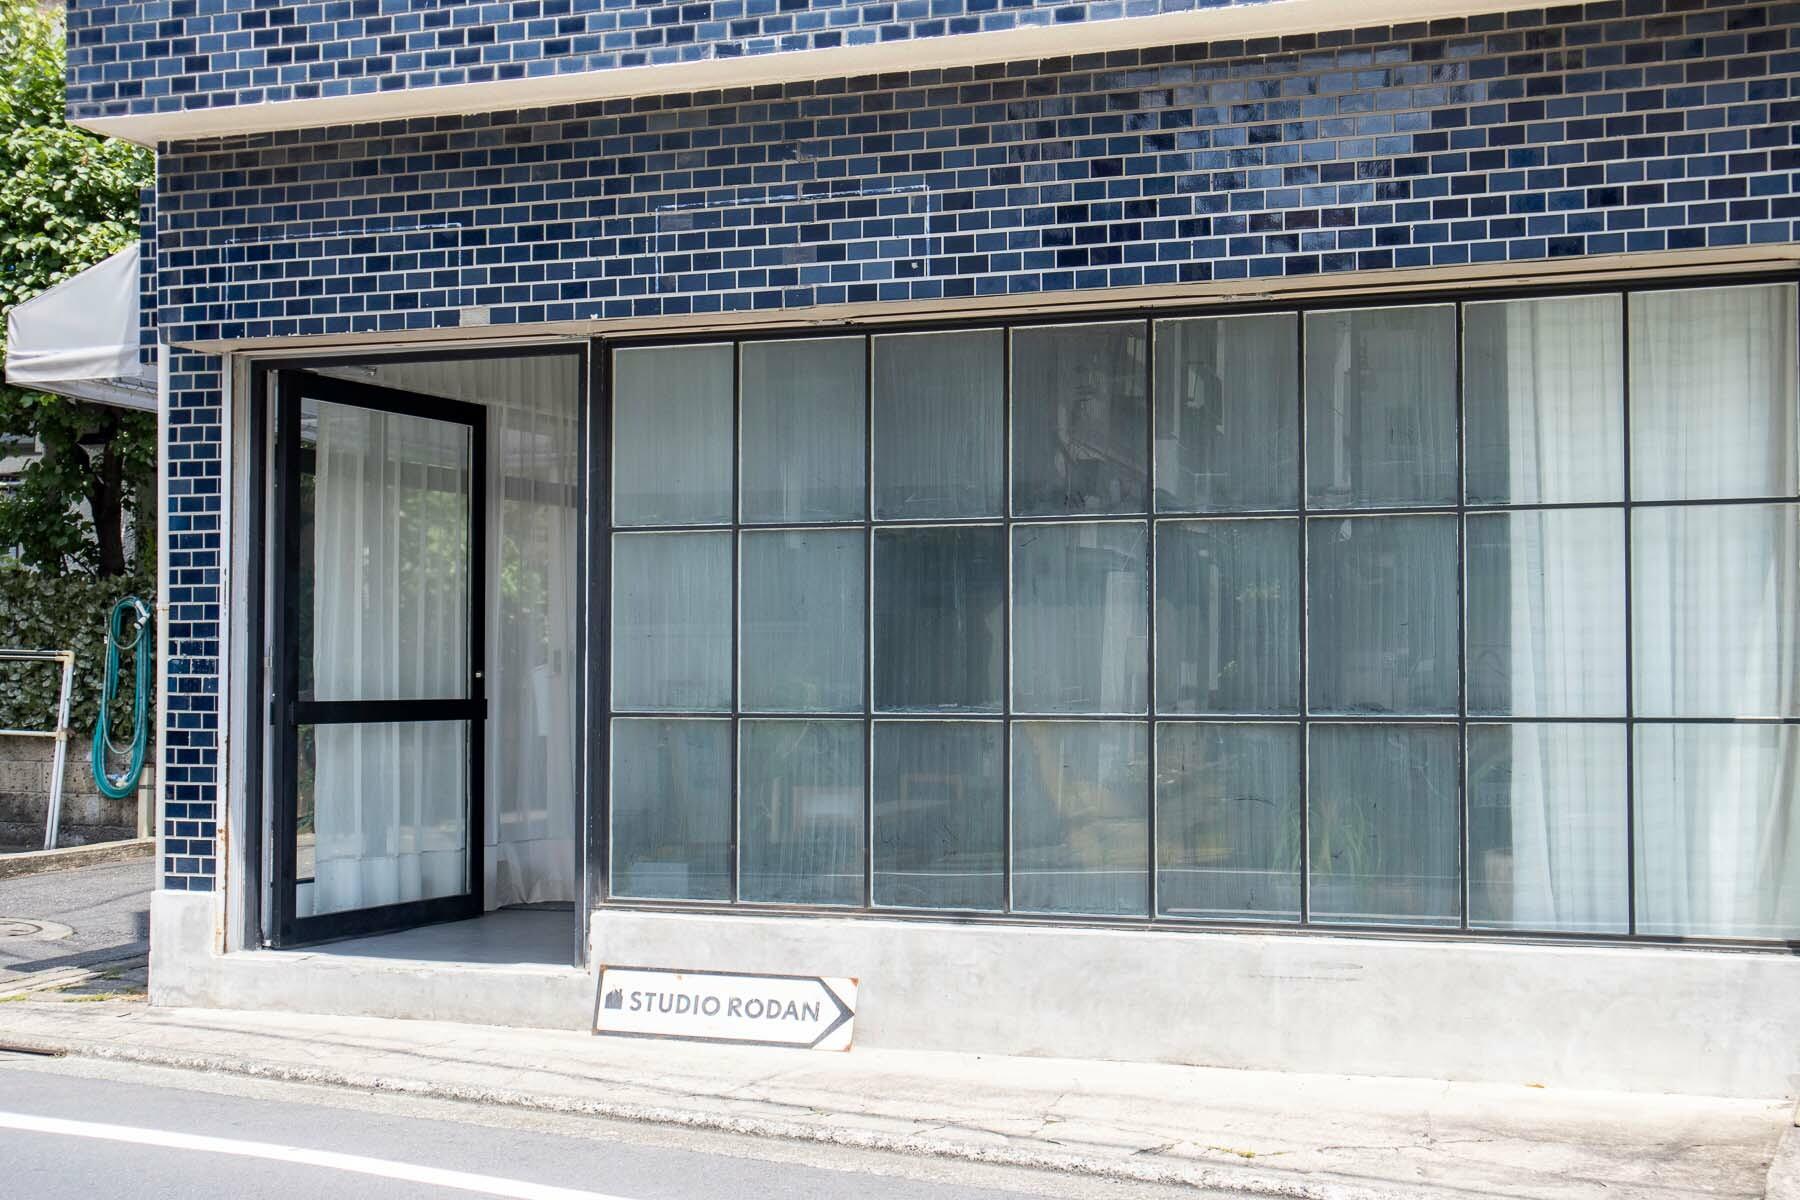 STUDIO RODAN(スタジオロダン) 1Fニュアンスのある格子窓